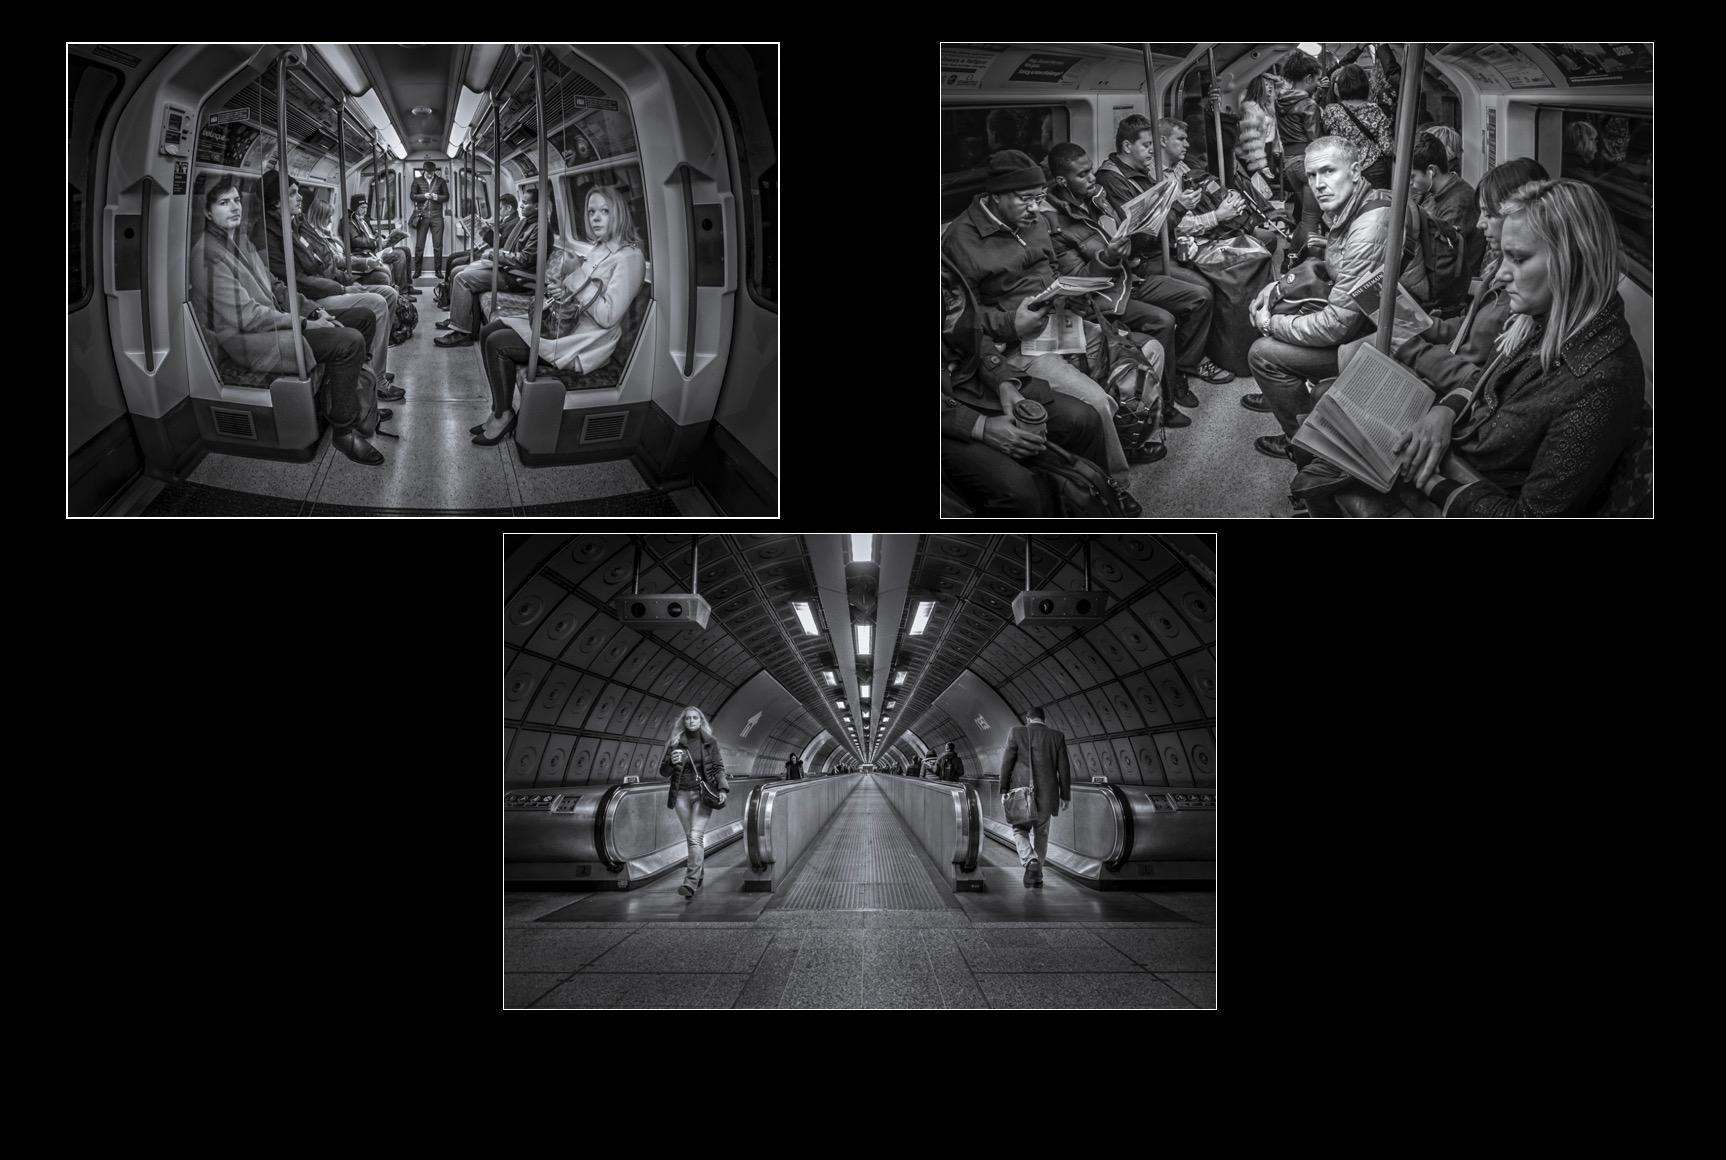 Tube Travellers - Judges Award- Monochrome Print